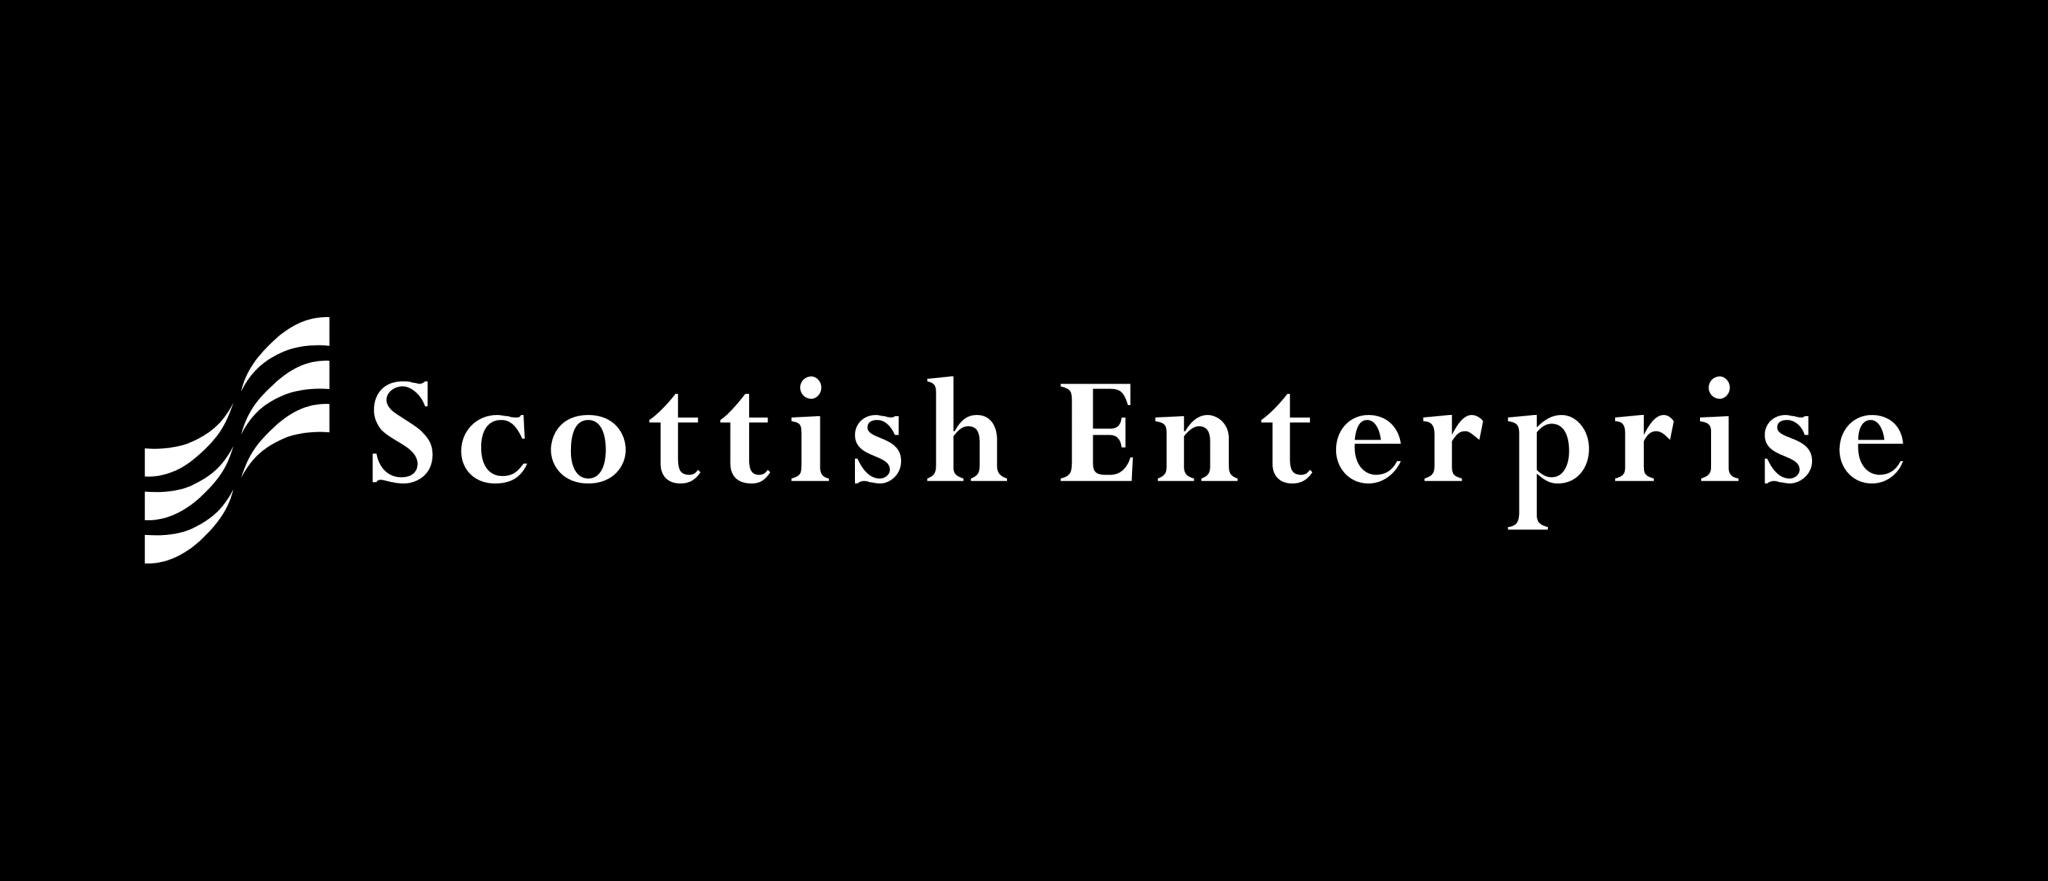 Scottish Enterprise Logo - Black@2x